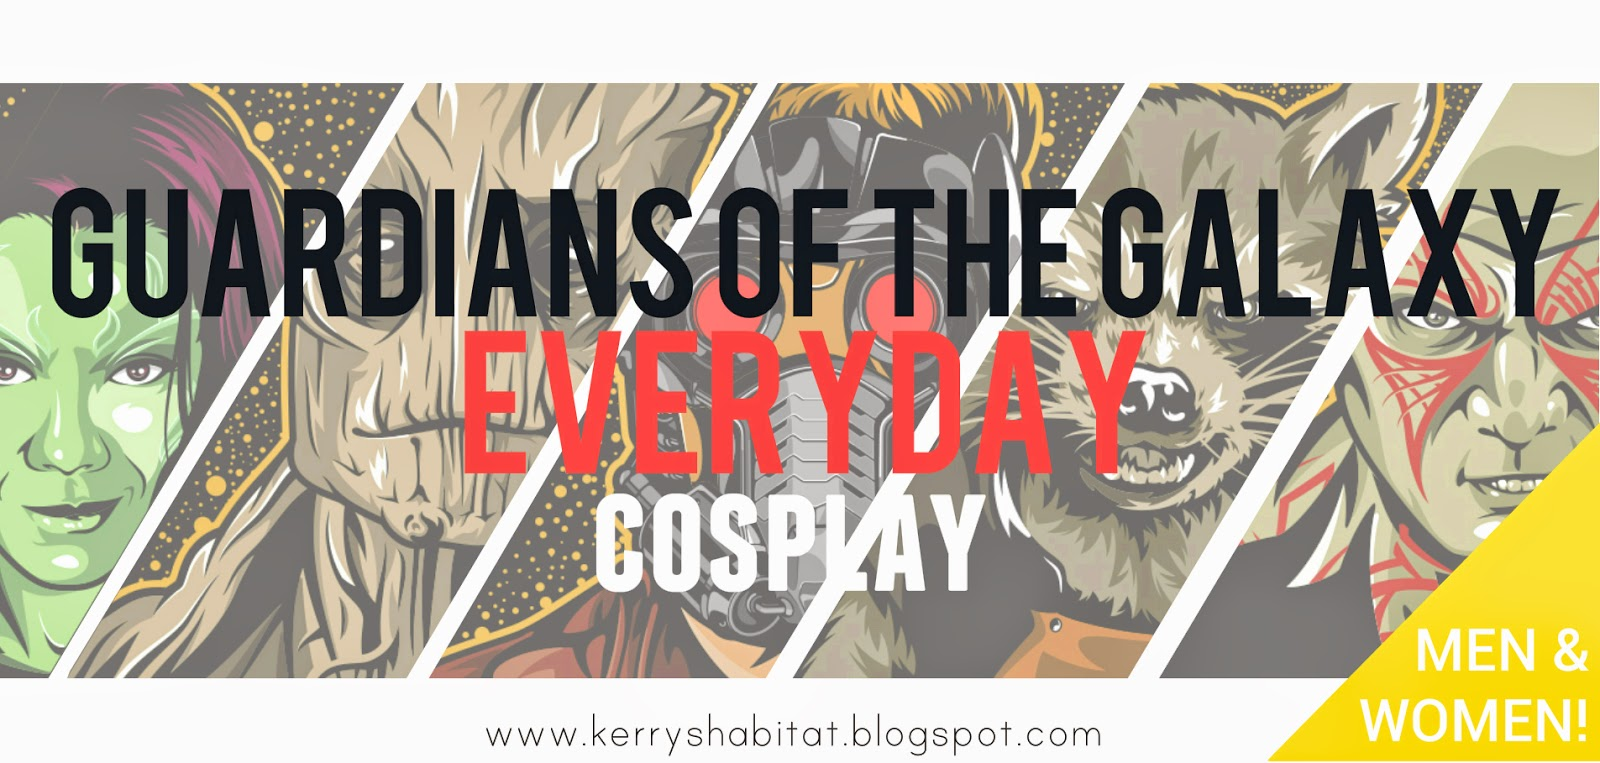 http://kerryshabitat.blogspot.co.uk/2014/08/gaurdians-of-galaxy-everyday-cosplay-men.html